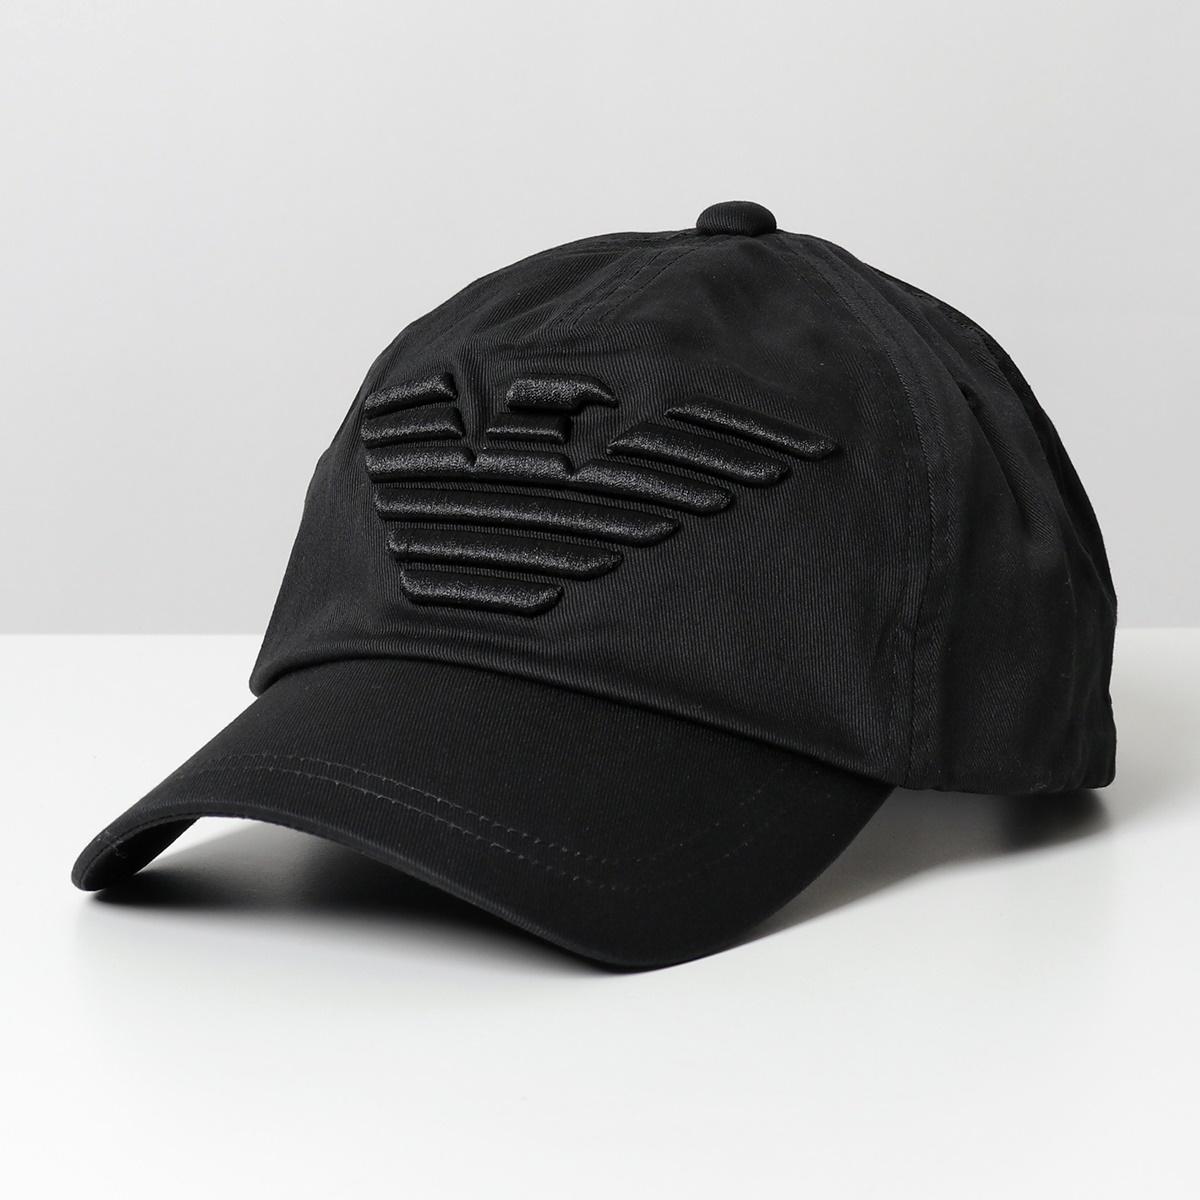 EMPORIO ARMANI エンポリオアルマーニ 国内即発送 627522 CC995 00020 BLACK コットン 帽子 通常便なら送料無料 イーグル立体刺繍 メンズ ベースボールキャップ